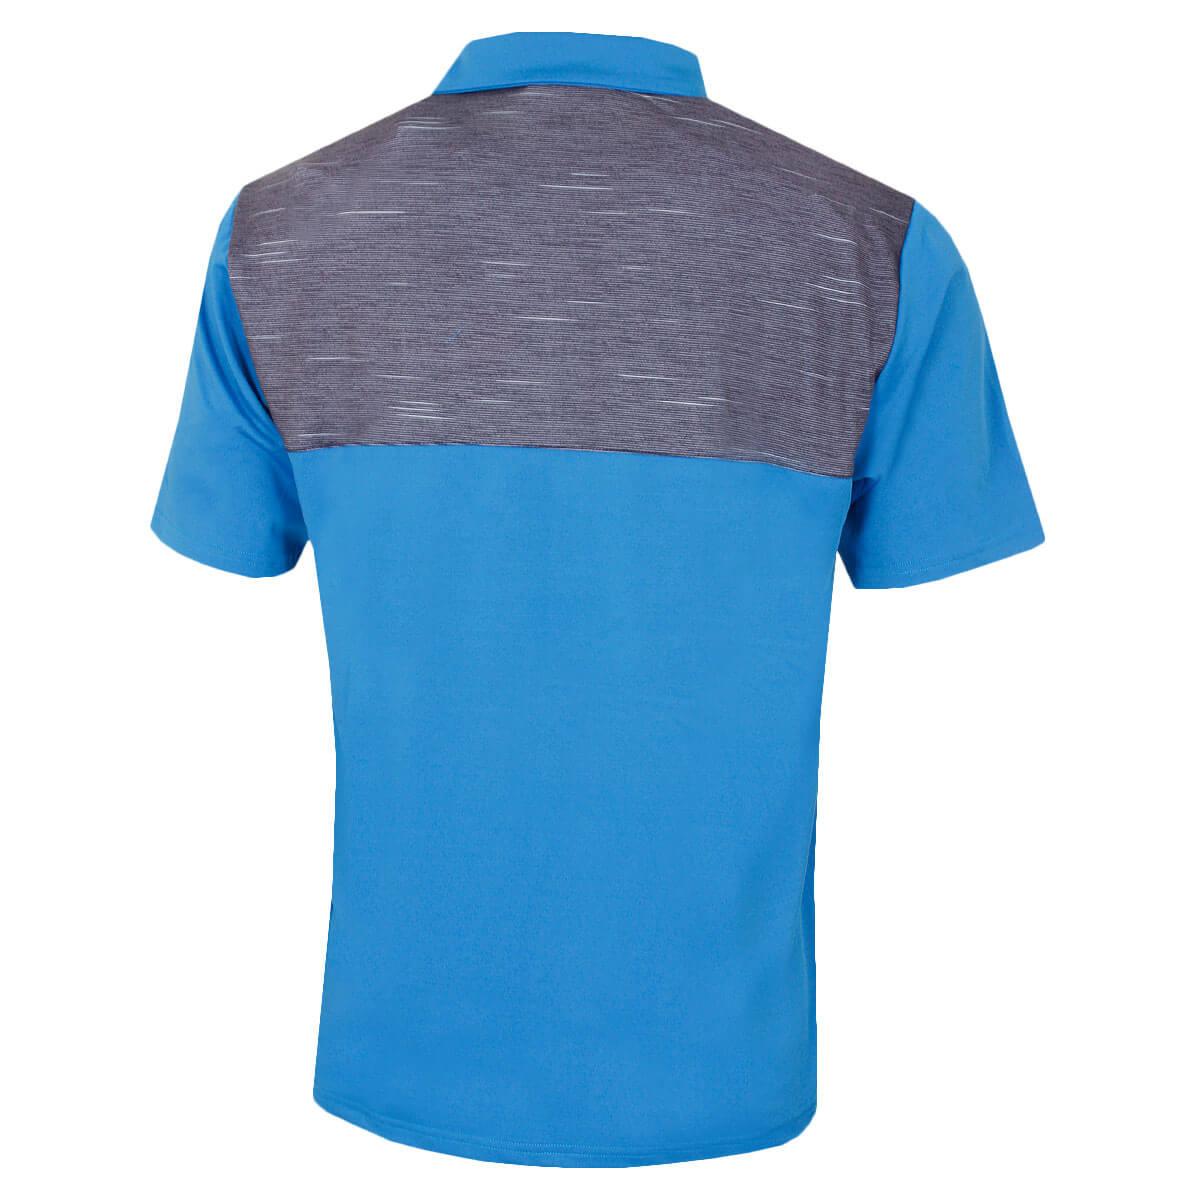 Island-Green-Mens-Golf-IGTS1891-Contrast-Yoke-Polo-Shirt-53-OFF-RRP thumbnail 7